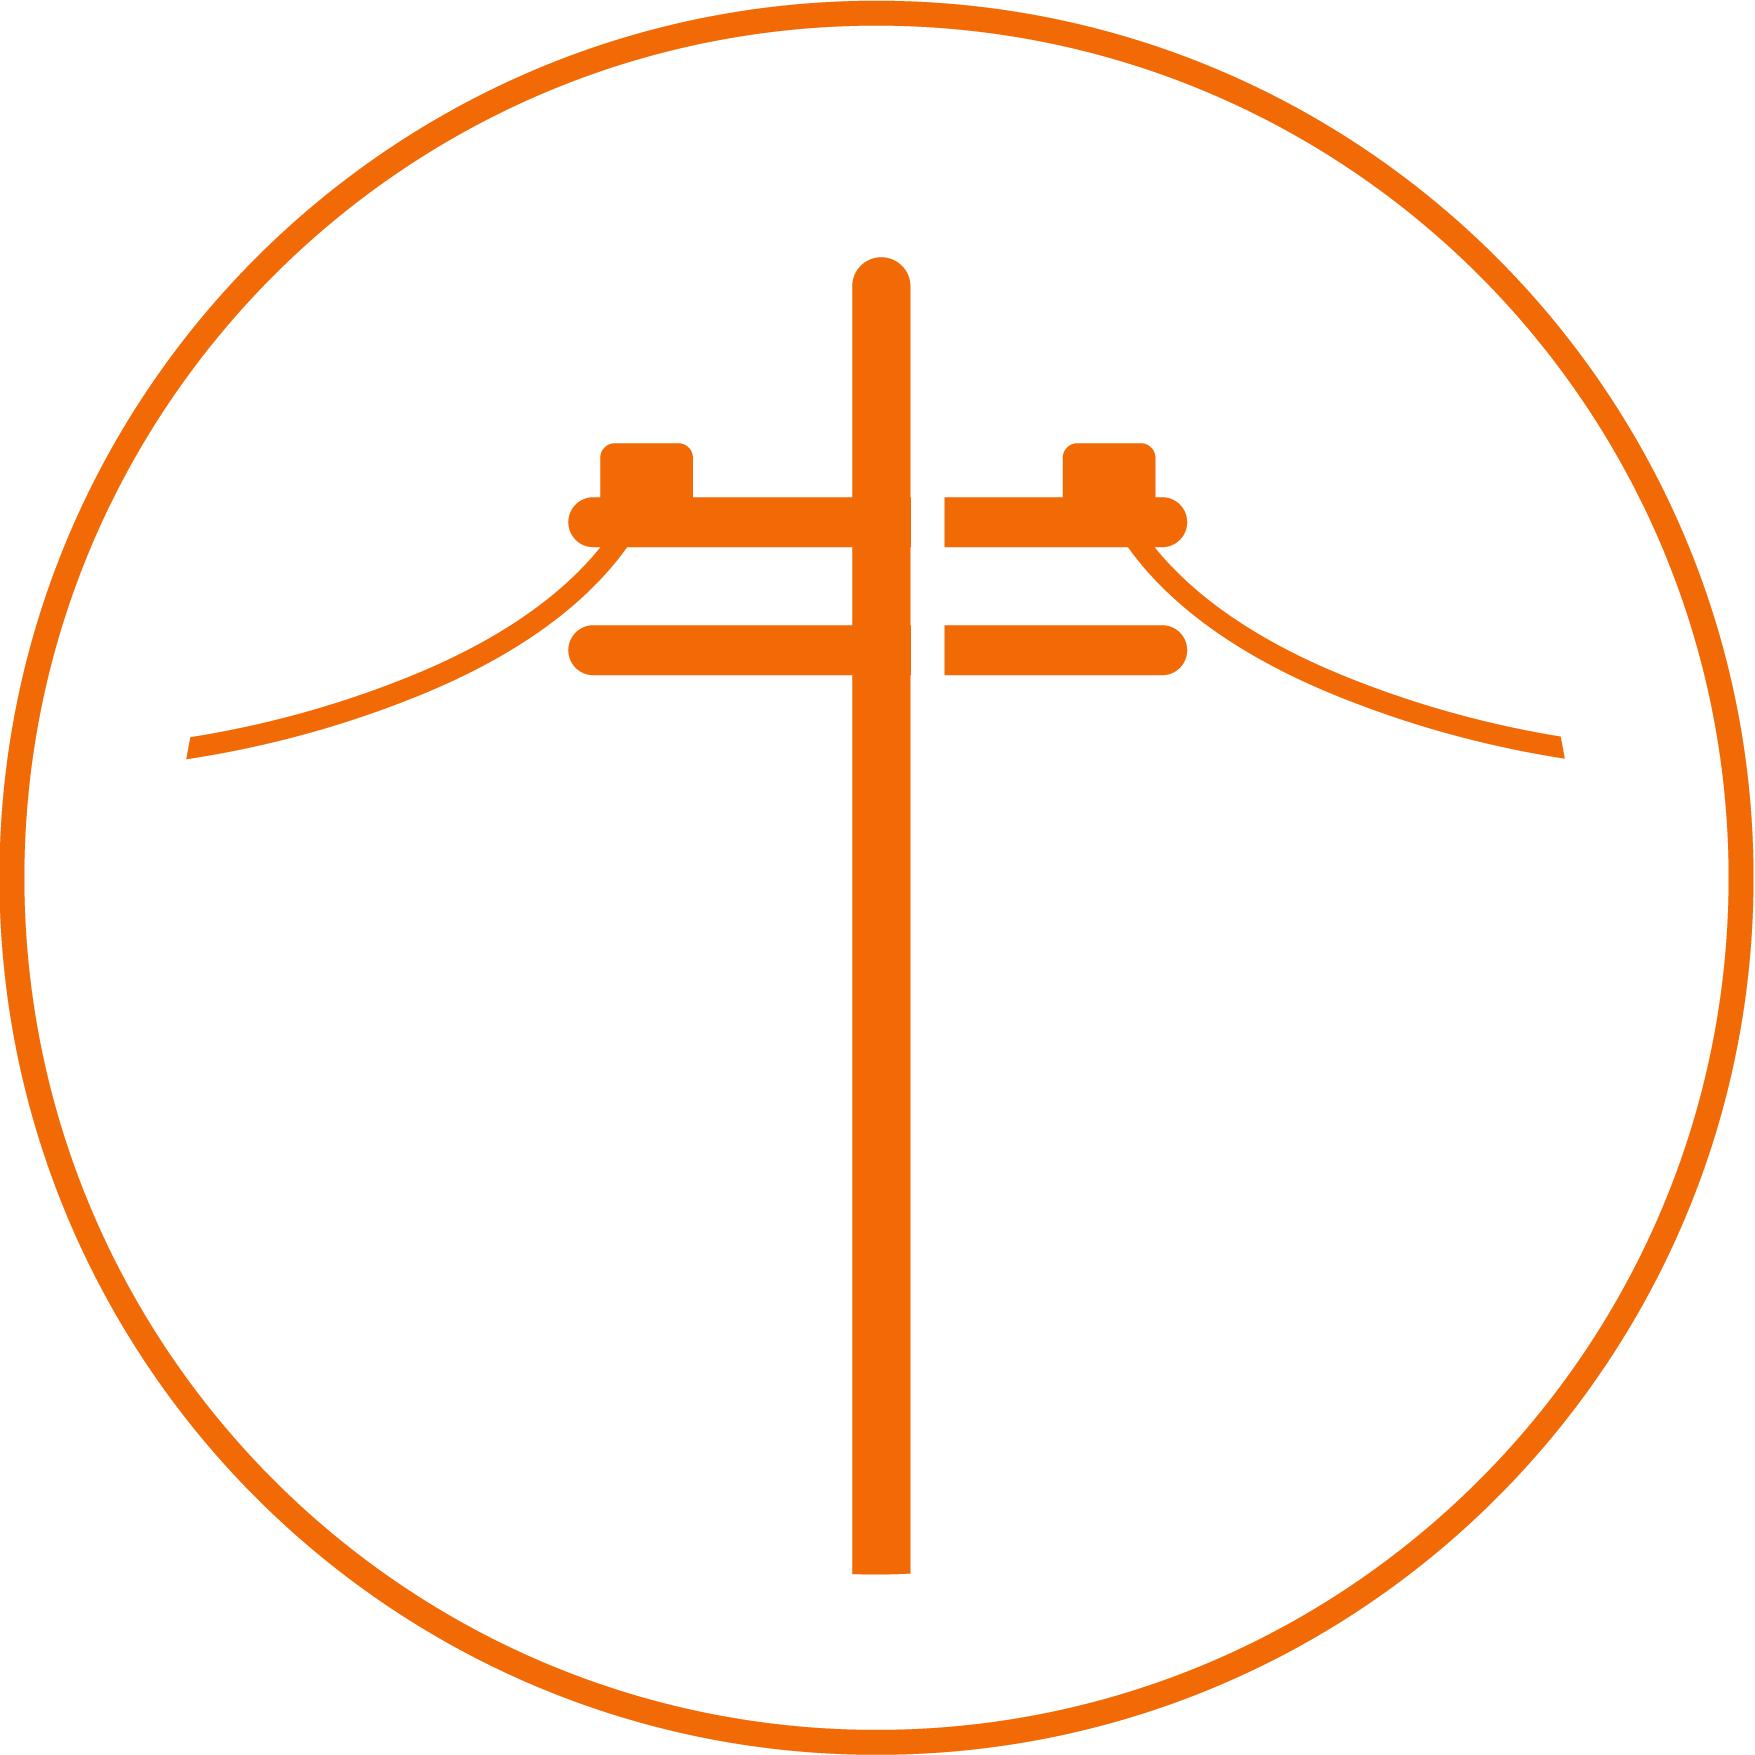 installation icon